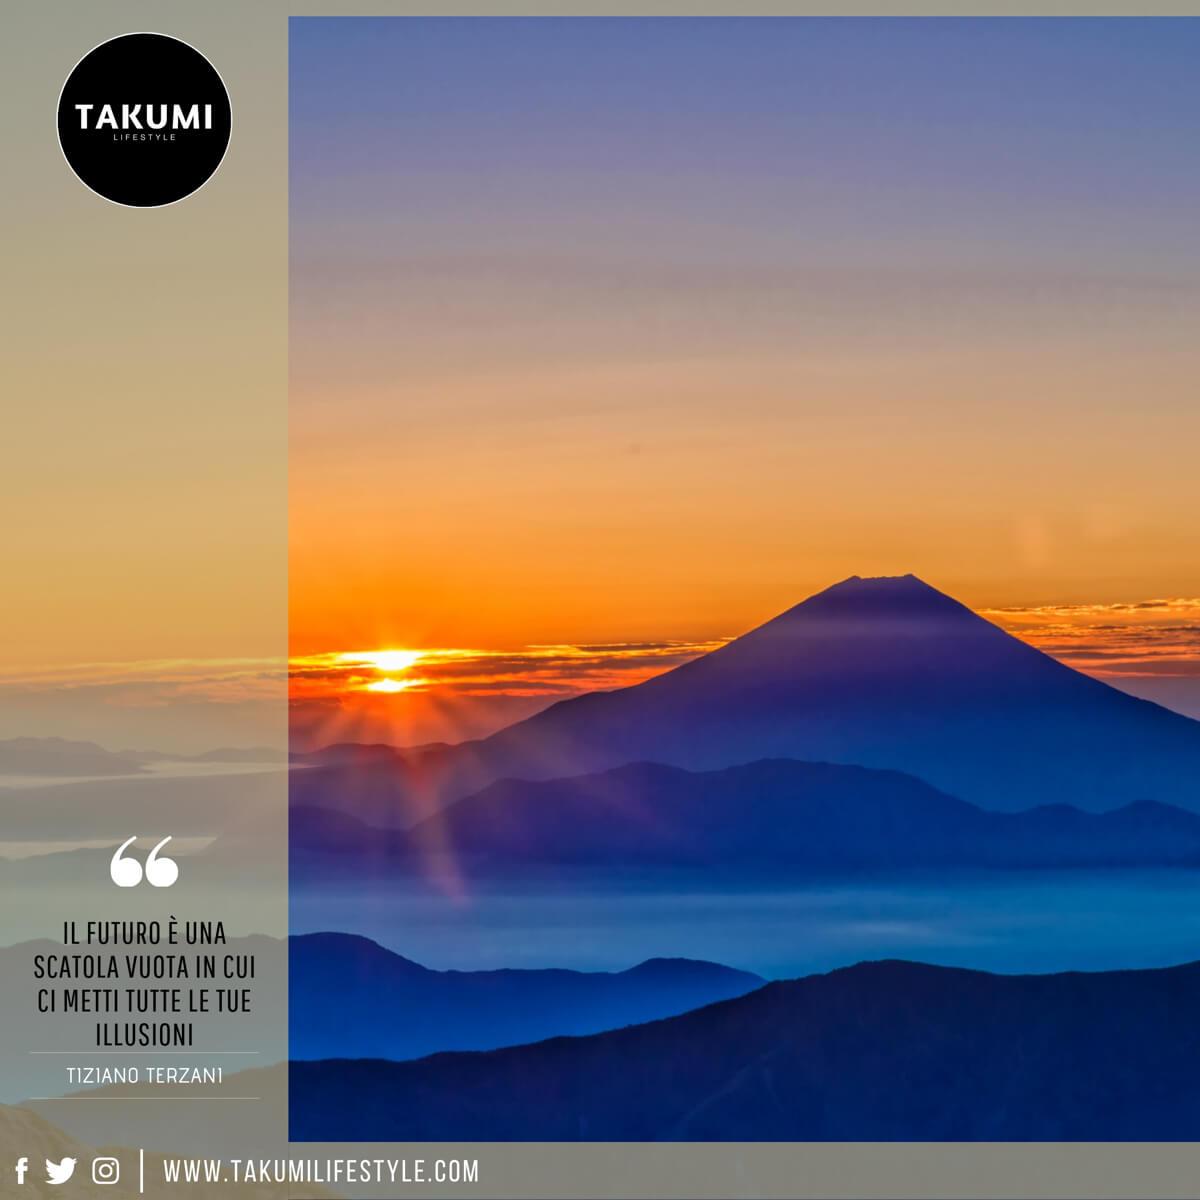 TAKUMI lifestyle | quote #28 - Tiziano Terzani